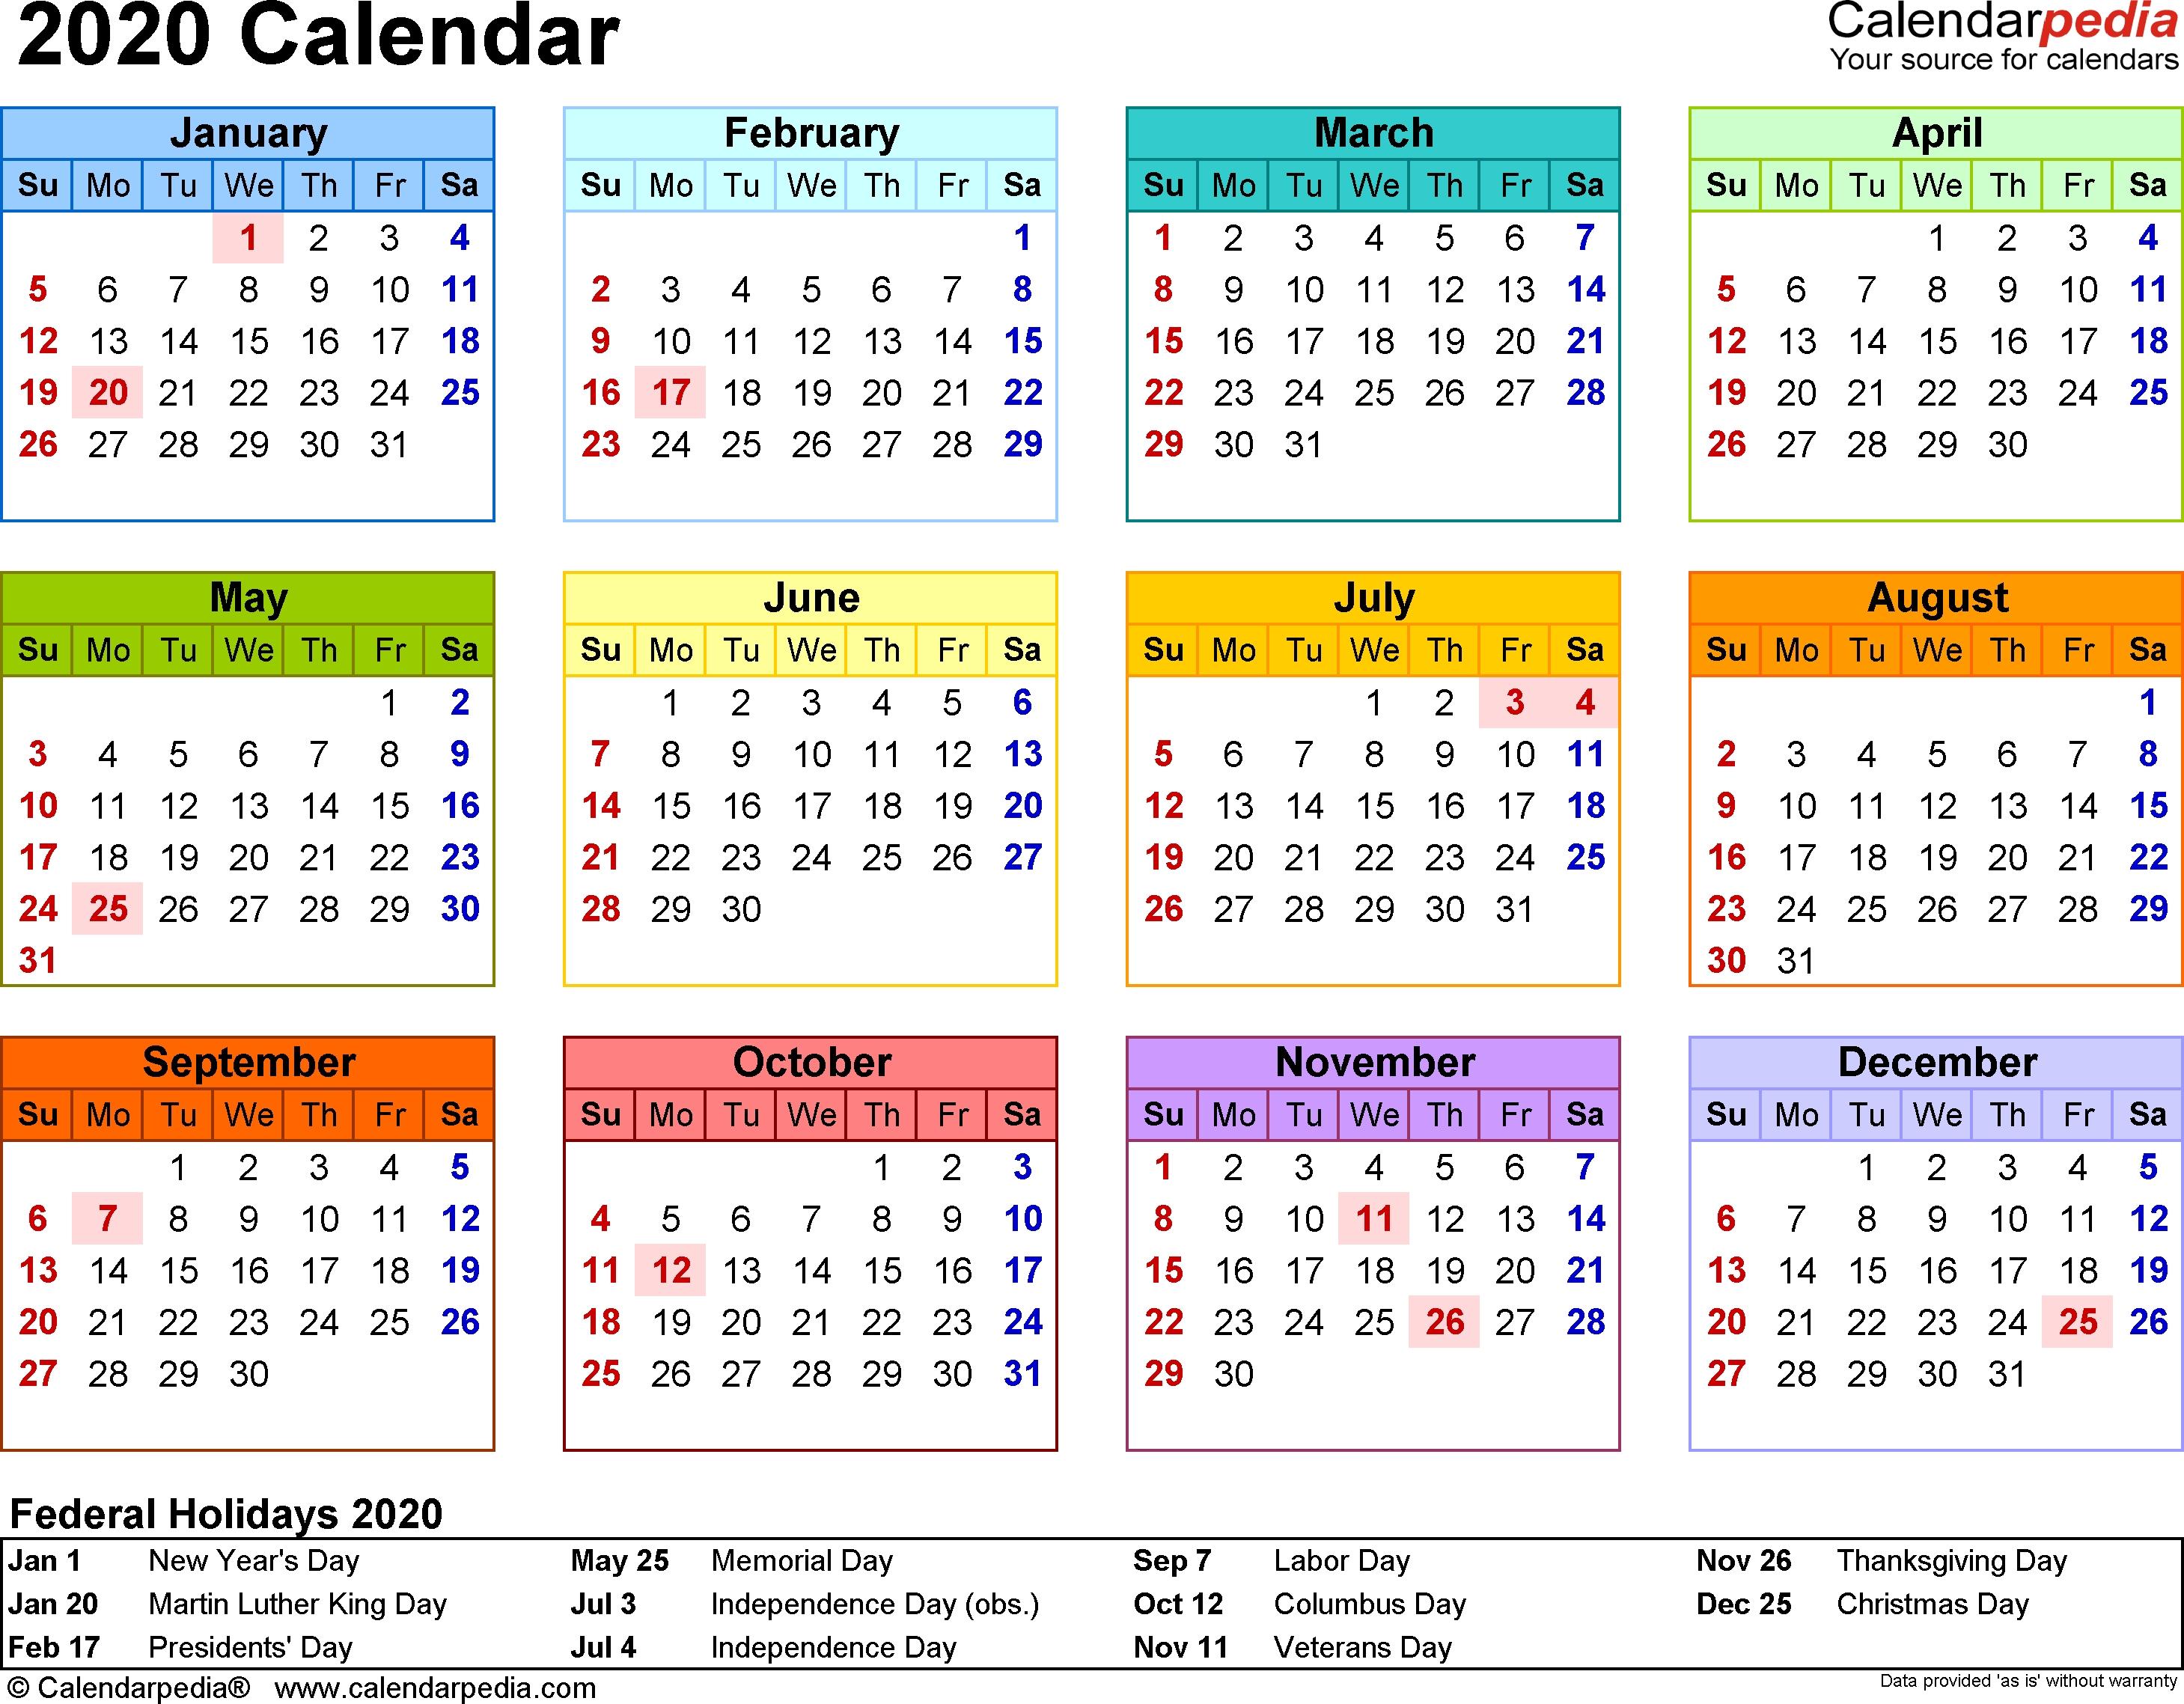 2020 Calendar - Download 17 Free Printable Excel Templates (.xlsx) Exceptional 2020 Excel Calendar Canada